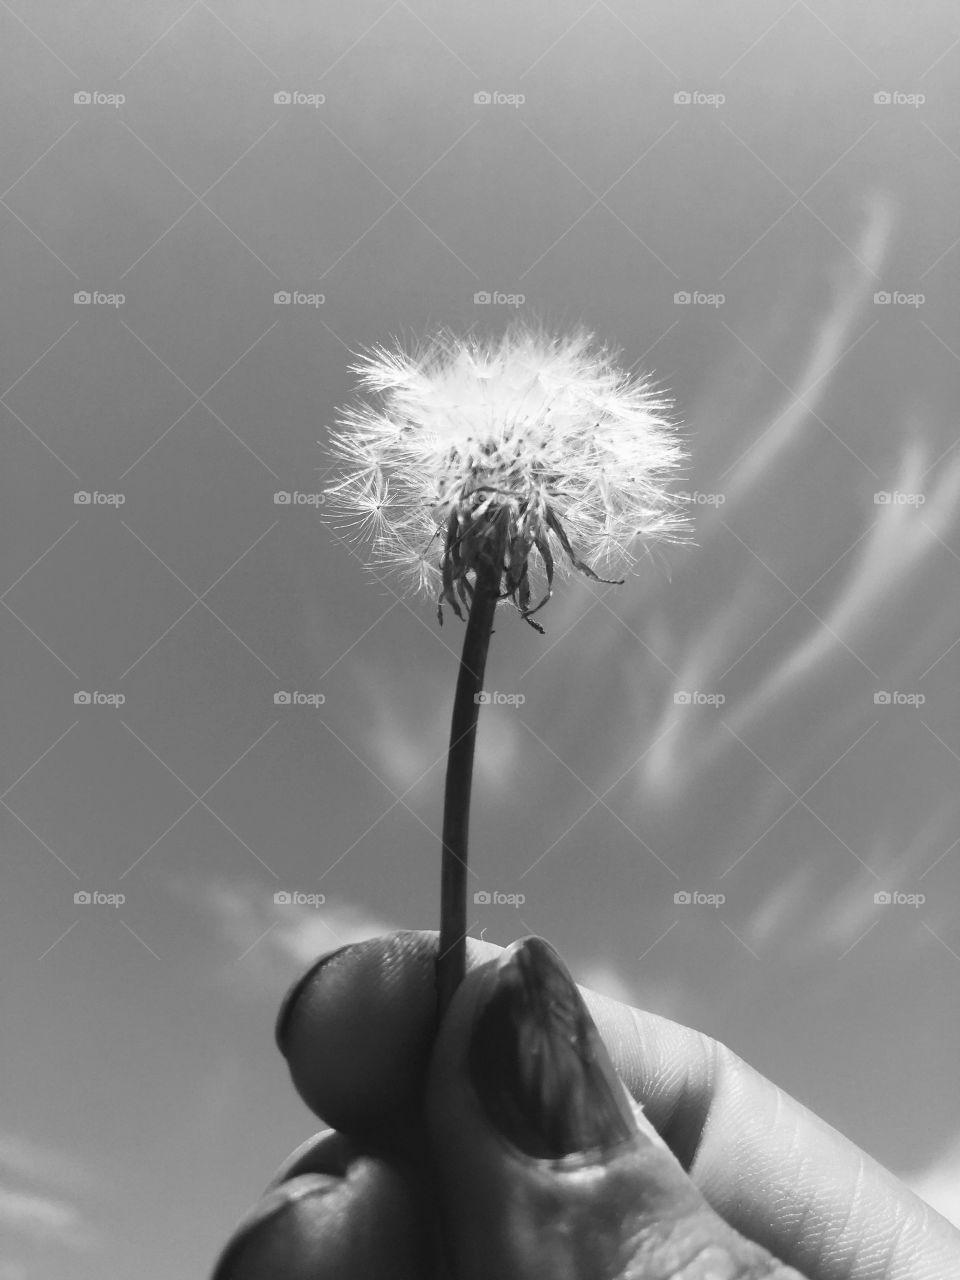 Black and white dreams